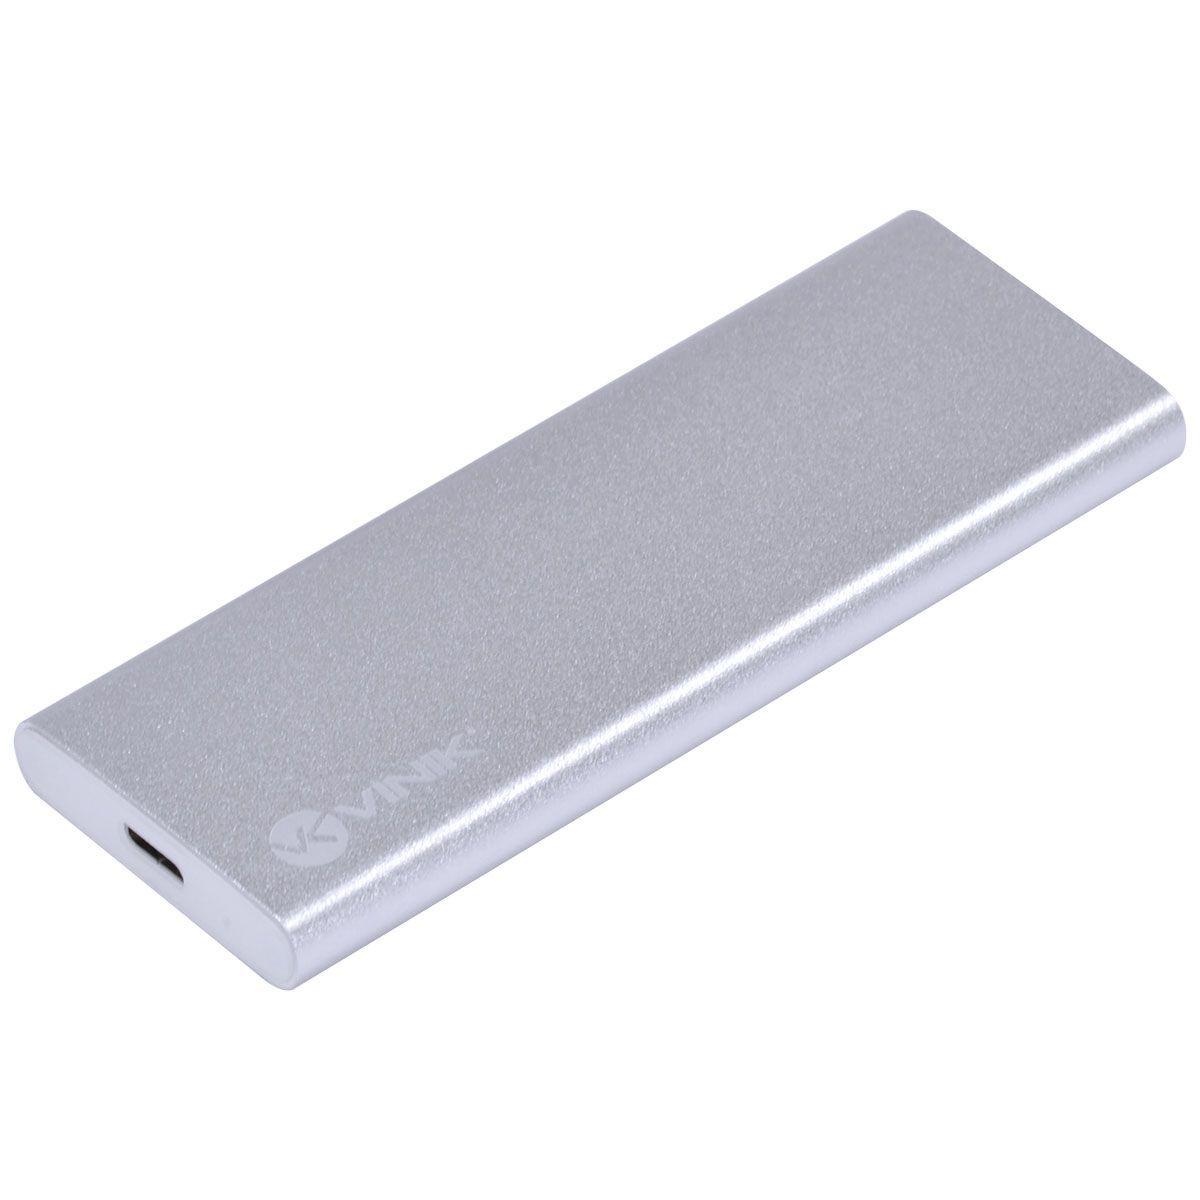 Case Externo para SSD M.2 USB Tipo C para USB 3.1 CS25-C31 29865 - Vinik